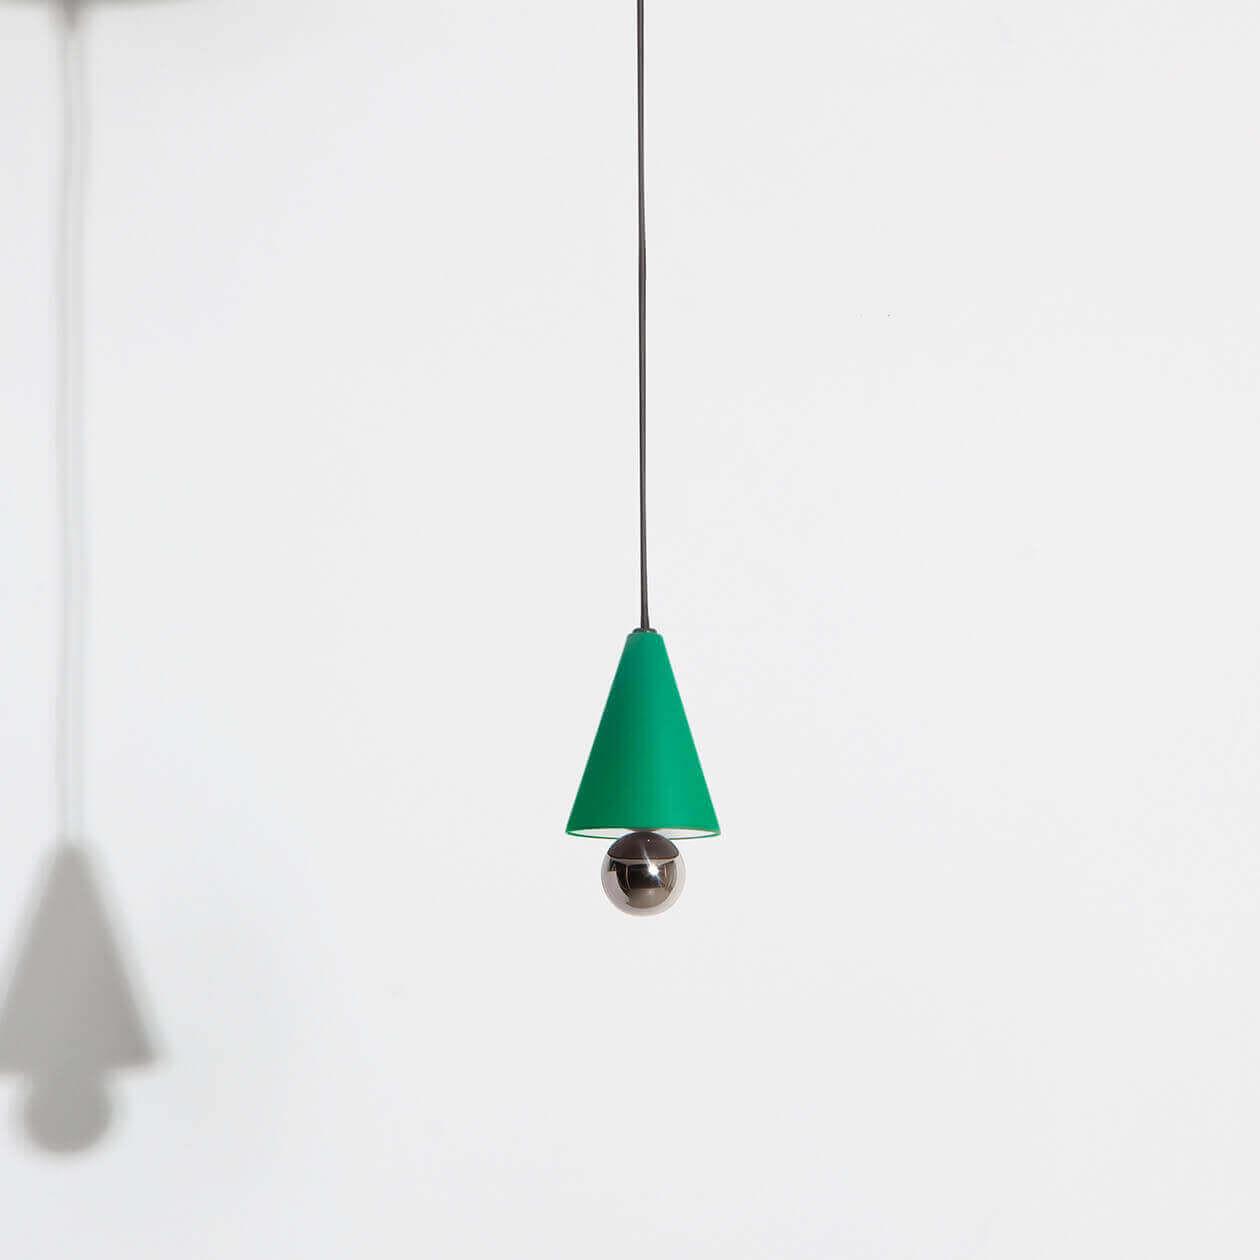 Suspension-mini-Cherry-vert-LED-Petite-Friture